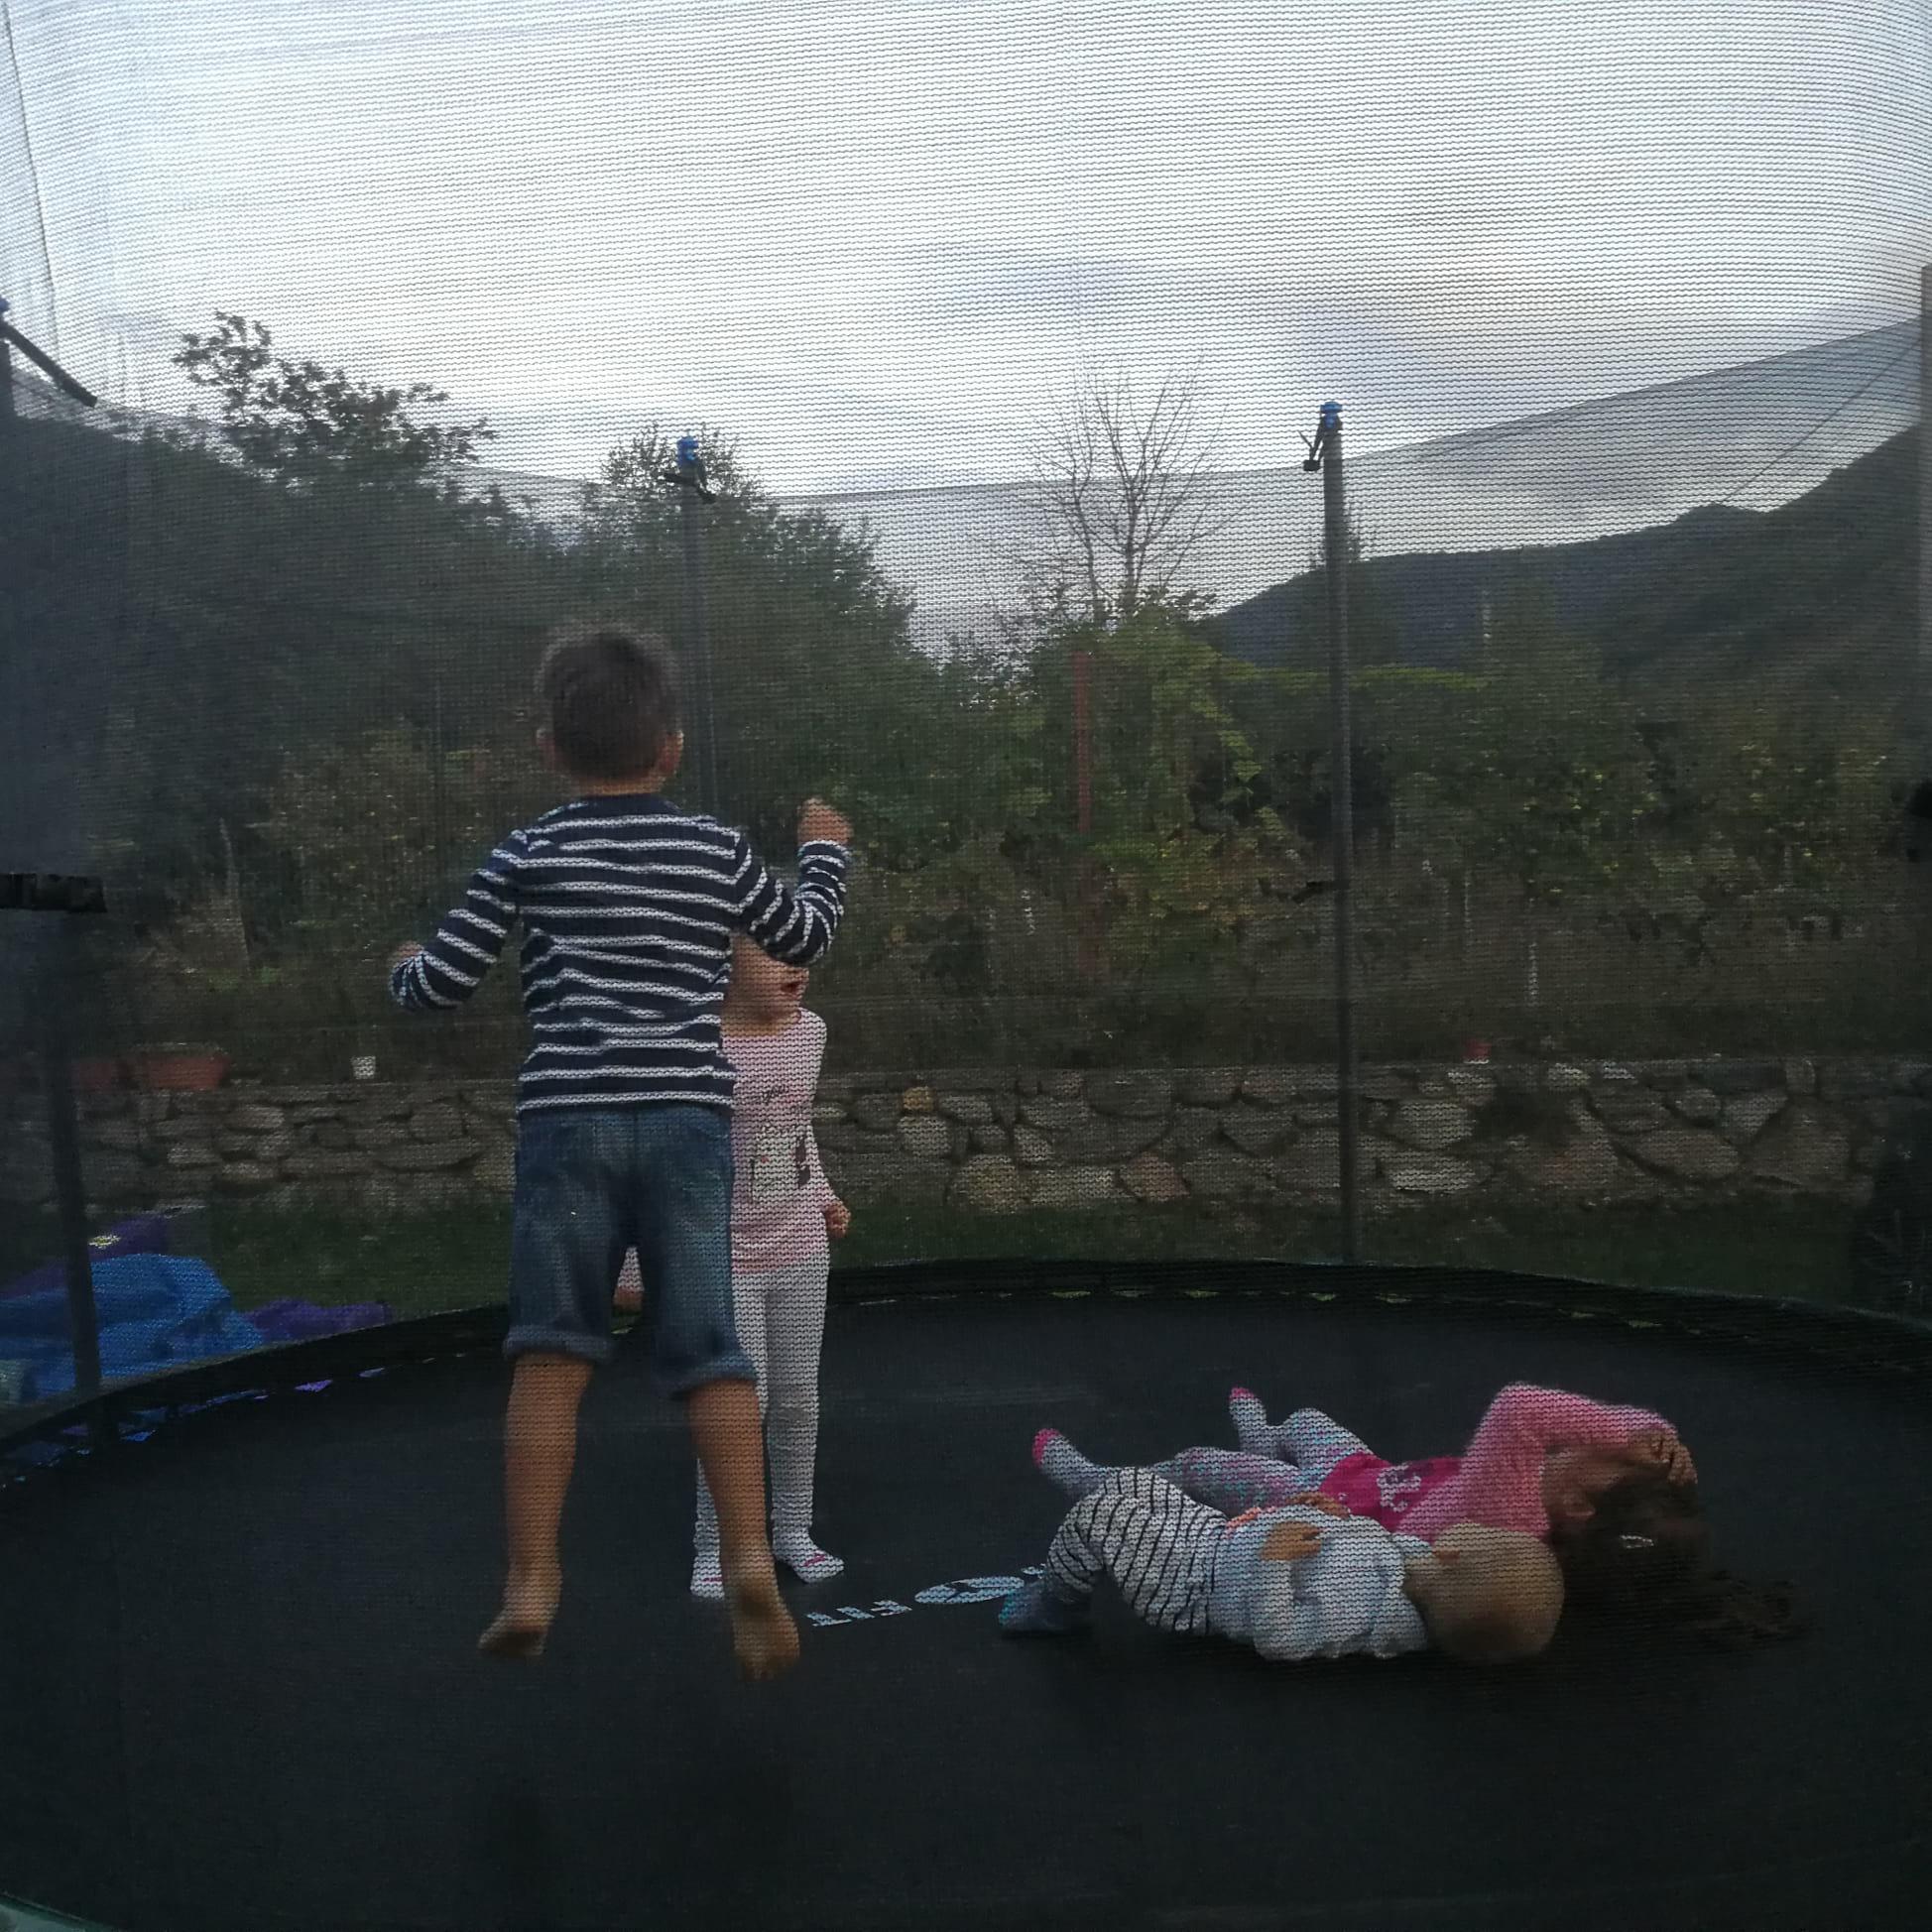 party-time-petreceri-copii-sibiu-gonflabila-trambulina-4